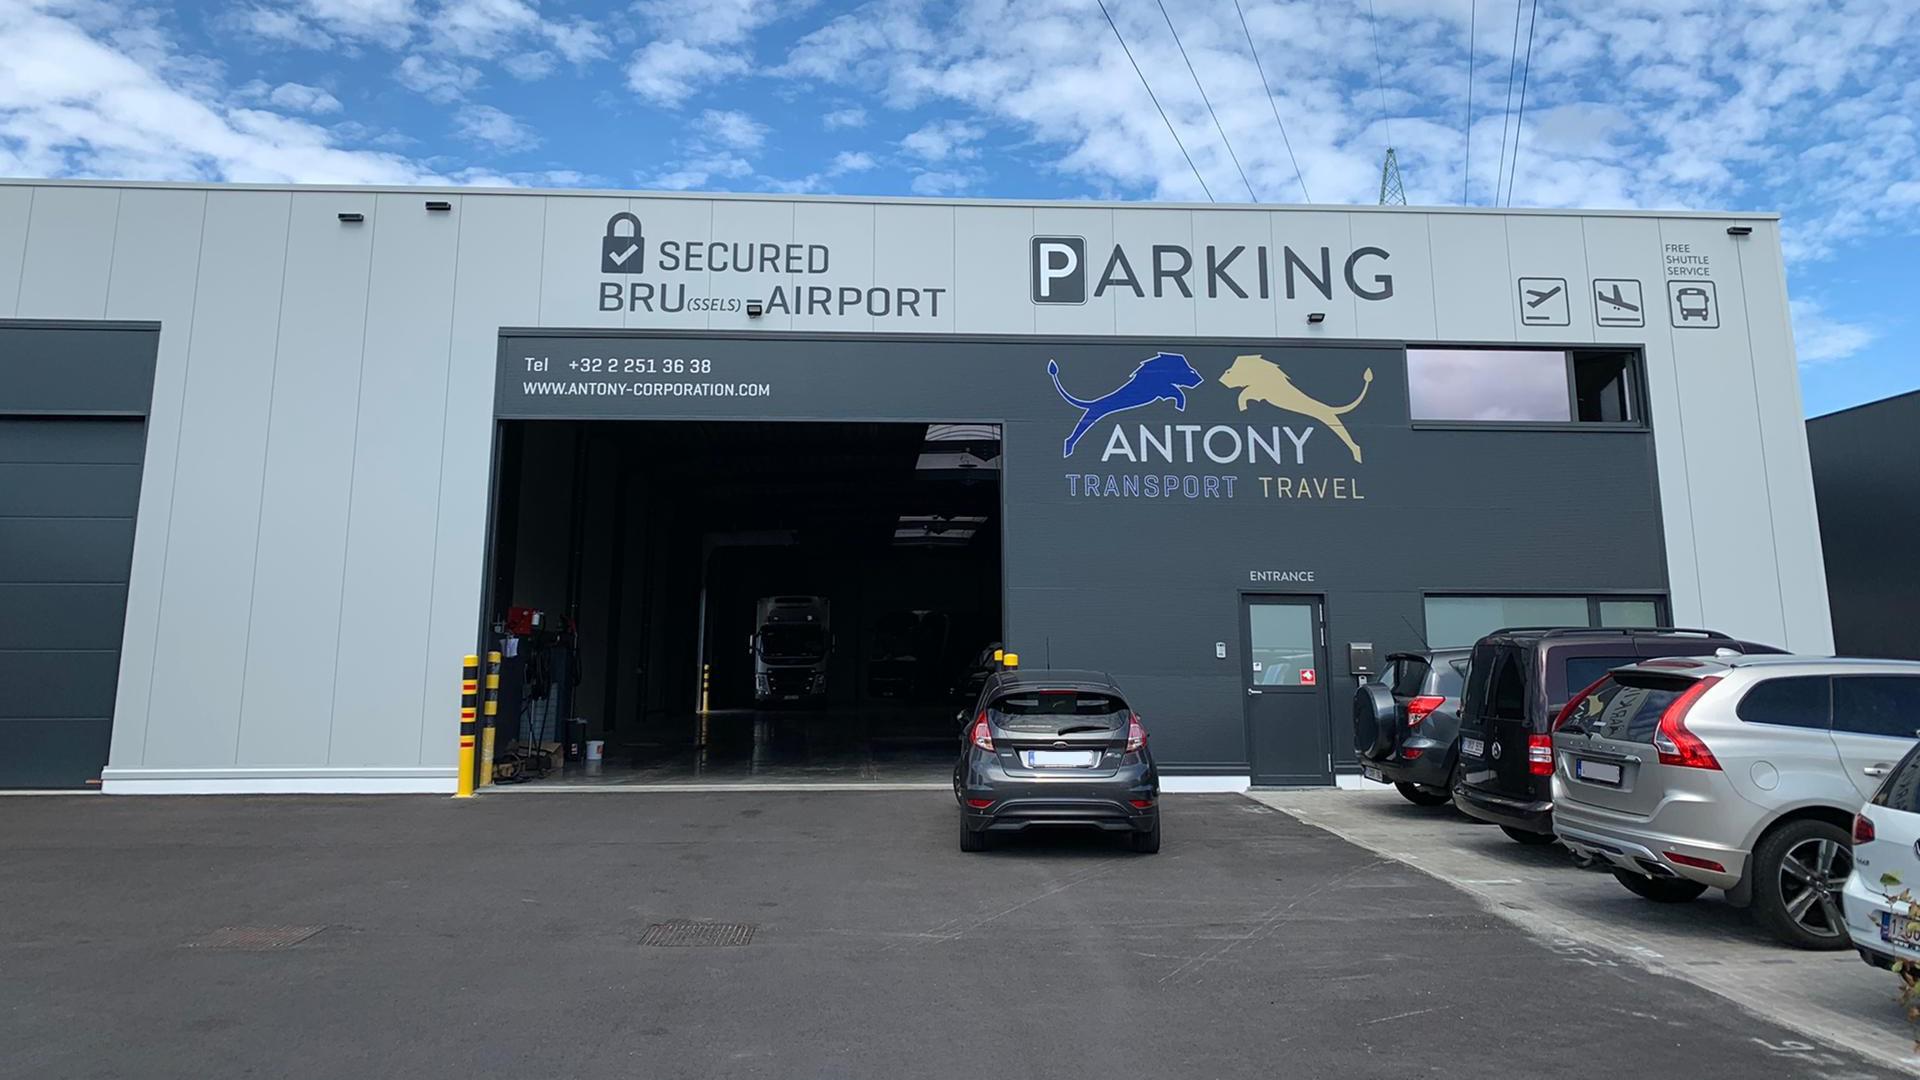 Antony Parking